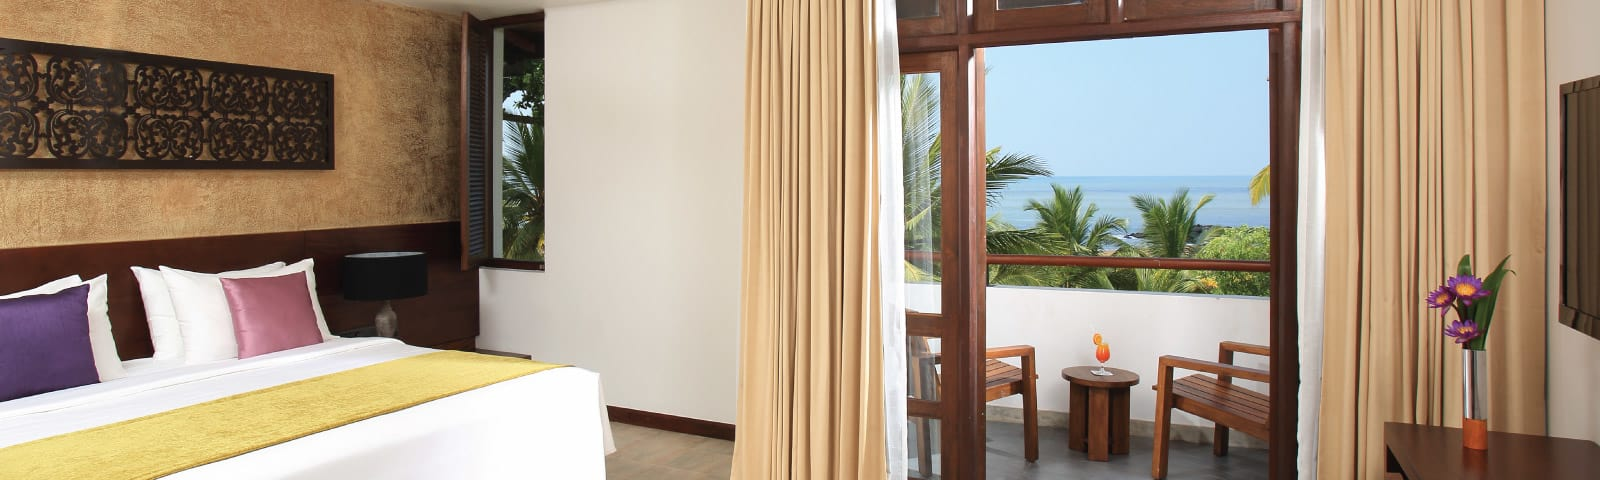 Special Sri Lanka Hotel Offers on accommodation